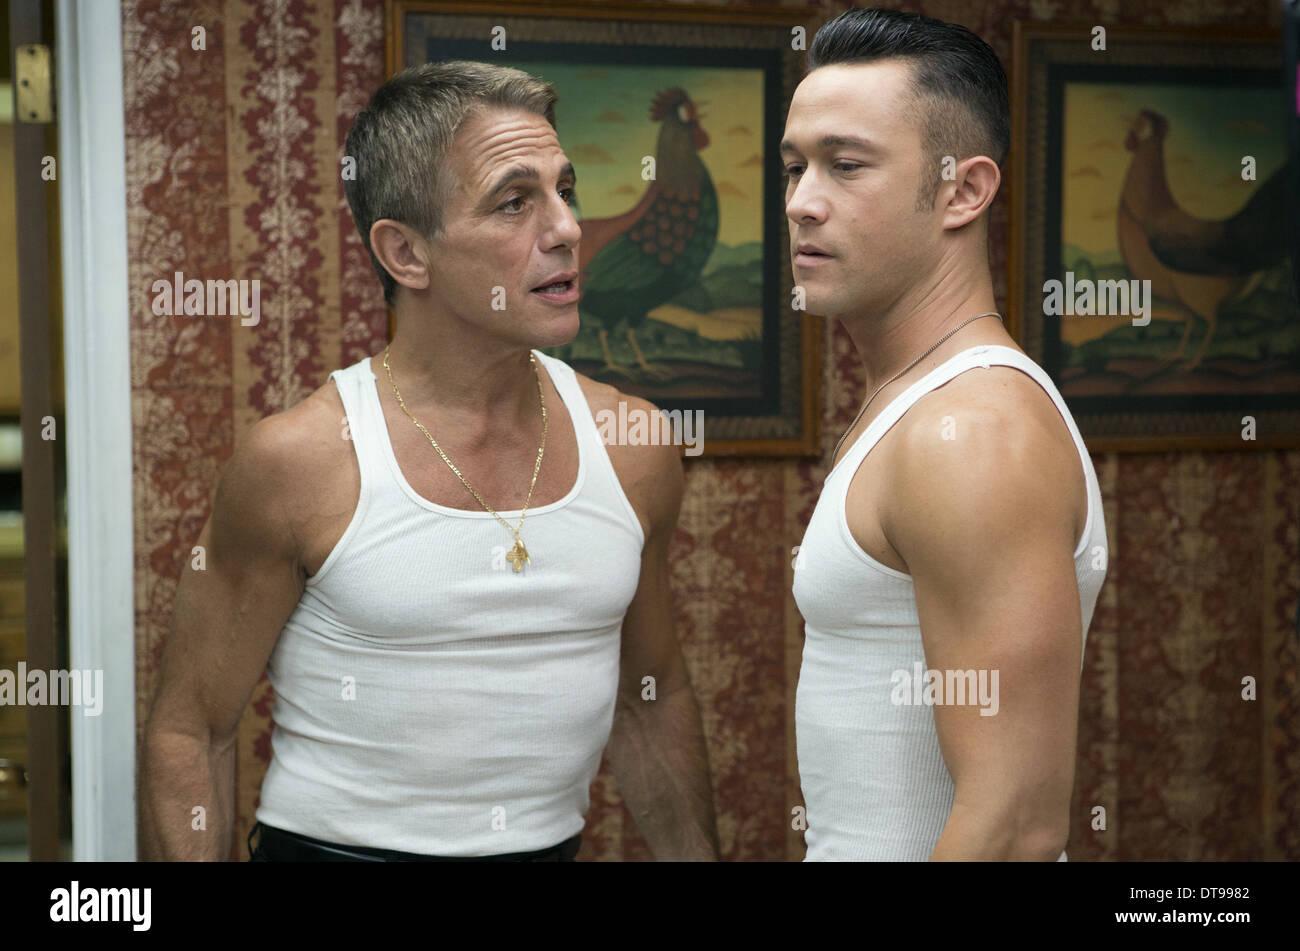 TONY DANZA & JOSEPH GORDON-LEVITT DON JON (2013) Imagen De Stock